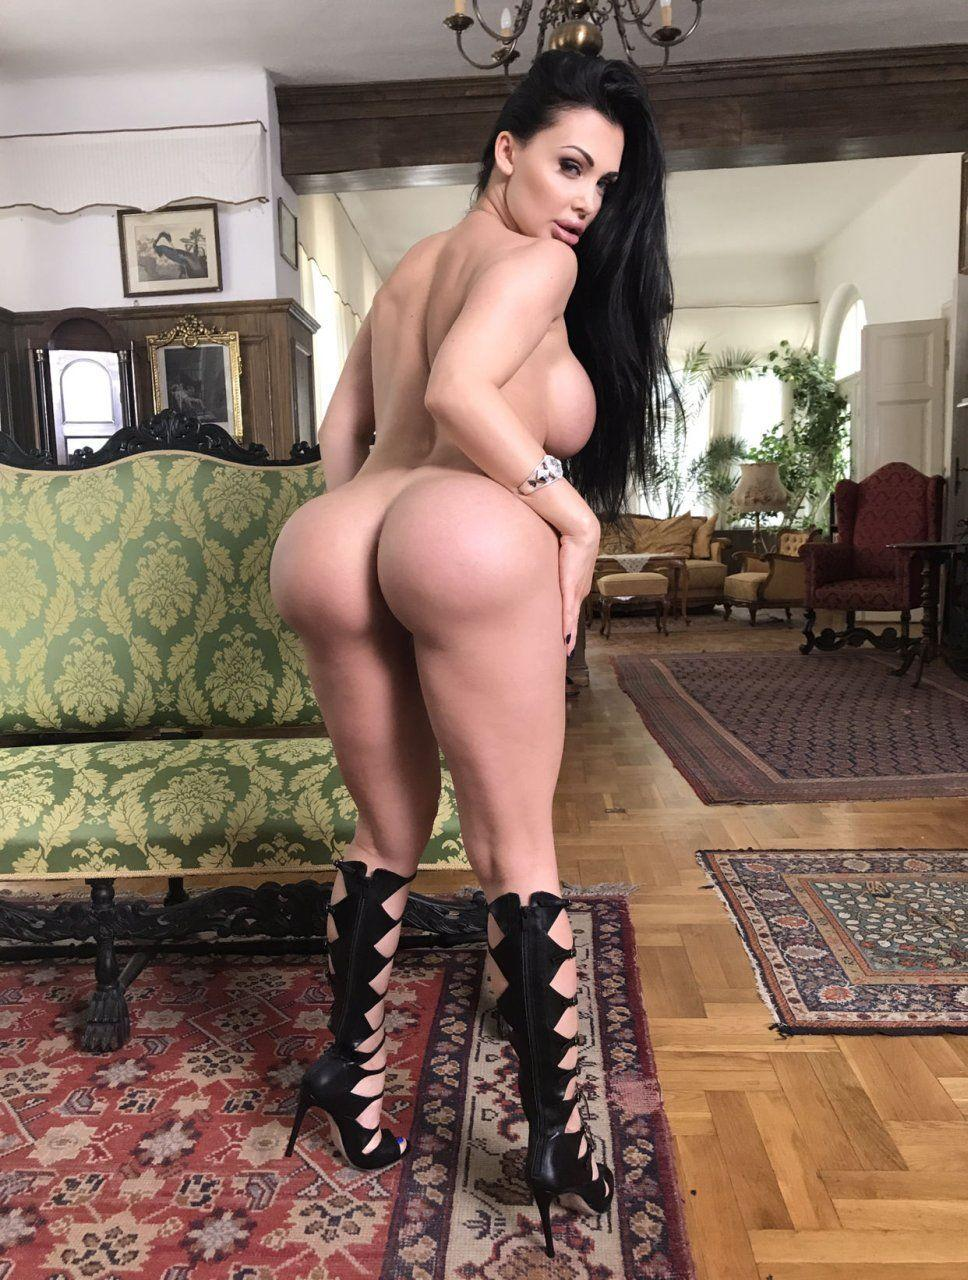 Barbra Streisand Fake Porn aletta ocean nude ass - hot naked pics.